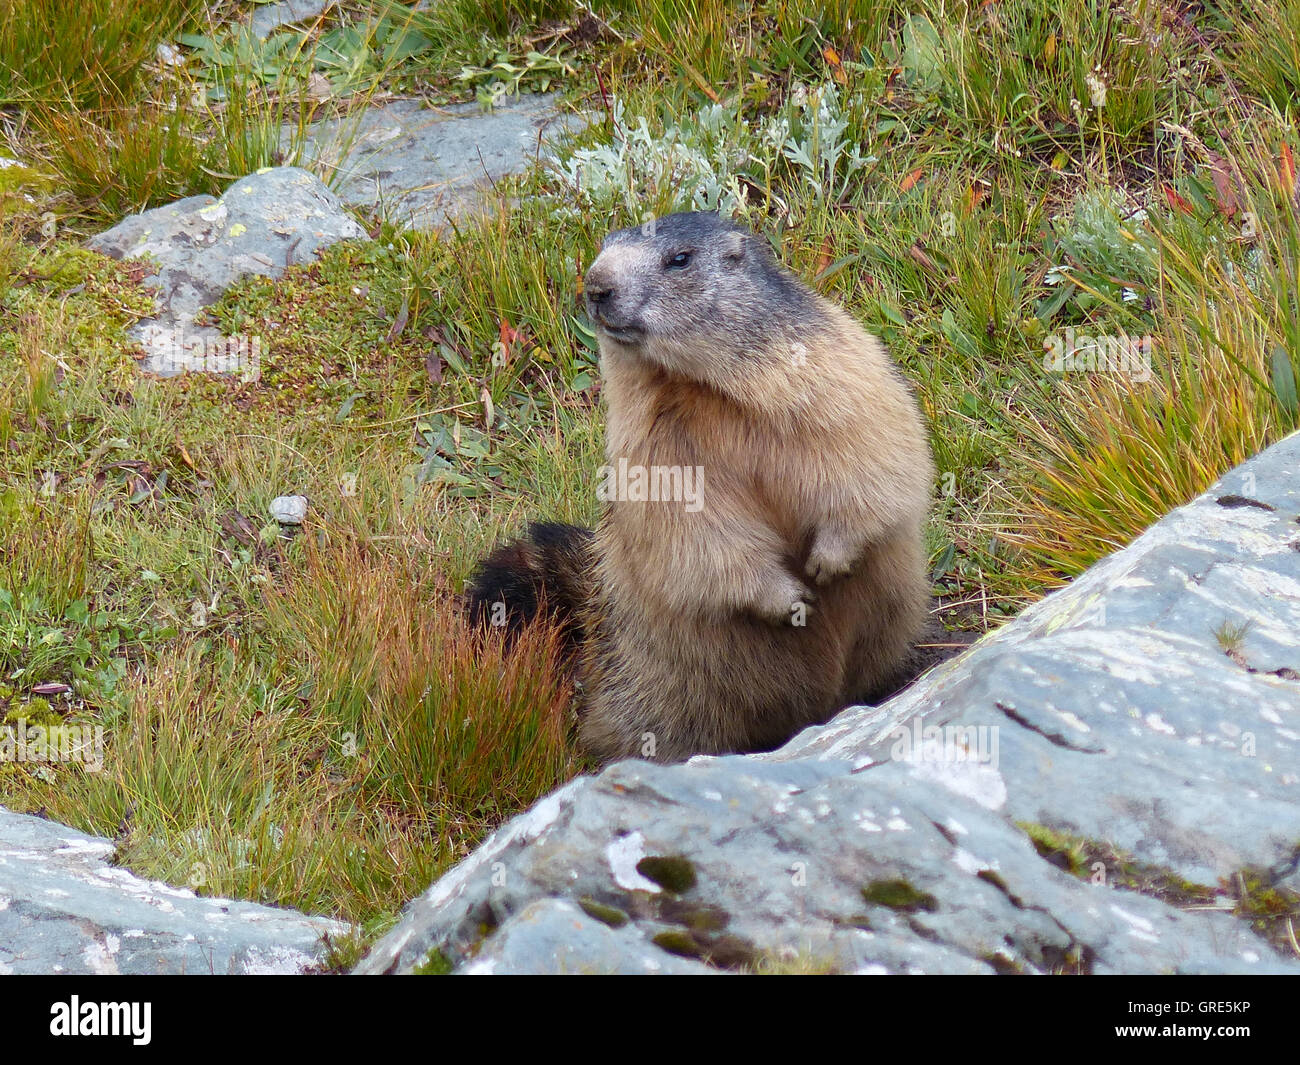 Marmot, Marmota Monax - Stock Image